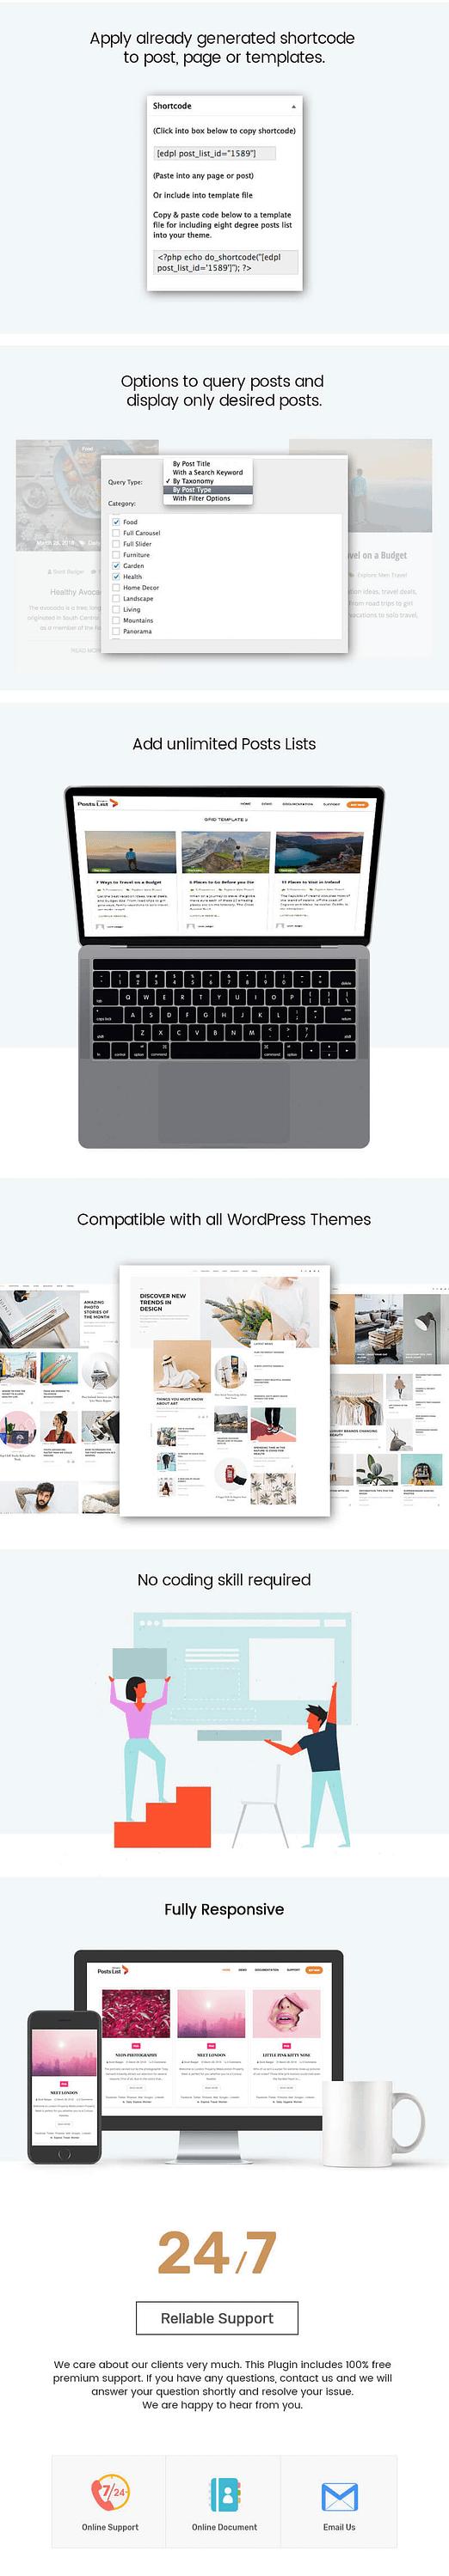 Eight Degree Posts List – Blog Post Designer Premium WordPress Plugin